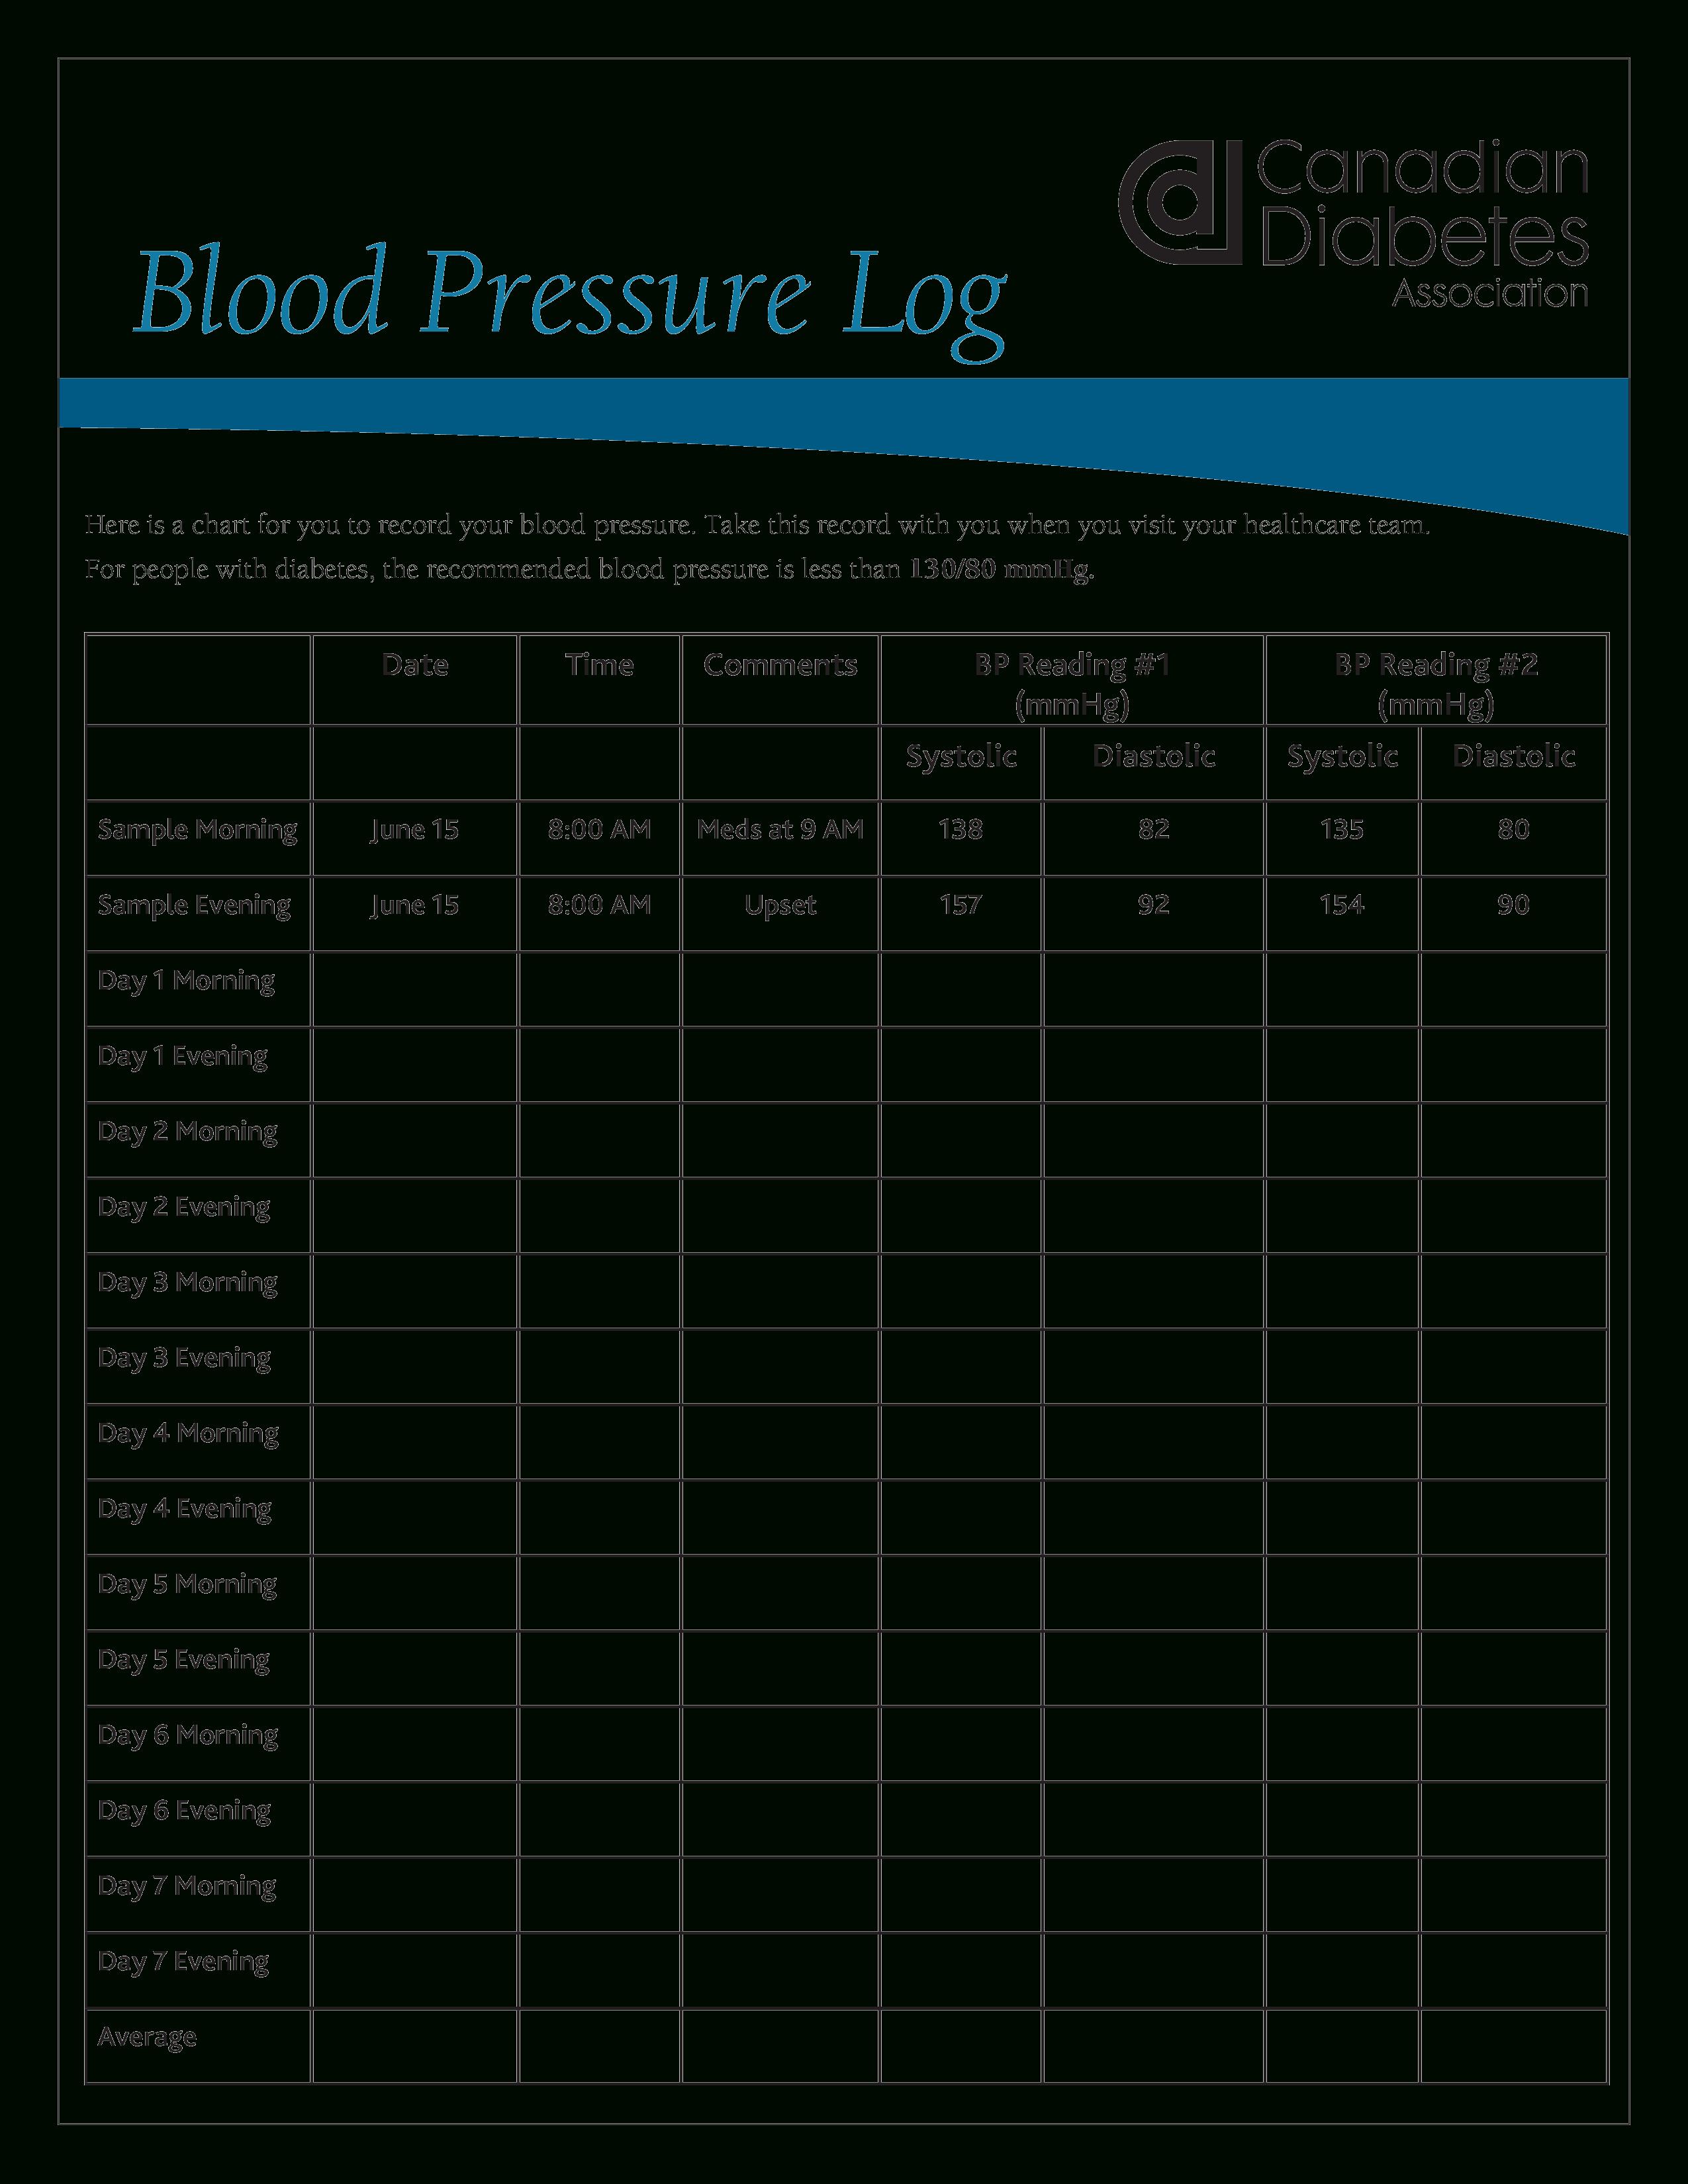 Printable Blood Pressure Log - How To Create A Blood Pressure Log | Blood Pressure Worksheets Printable